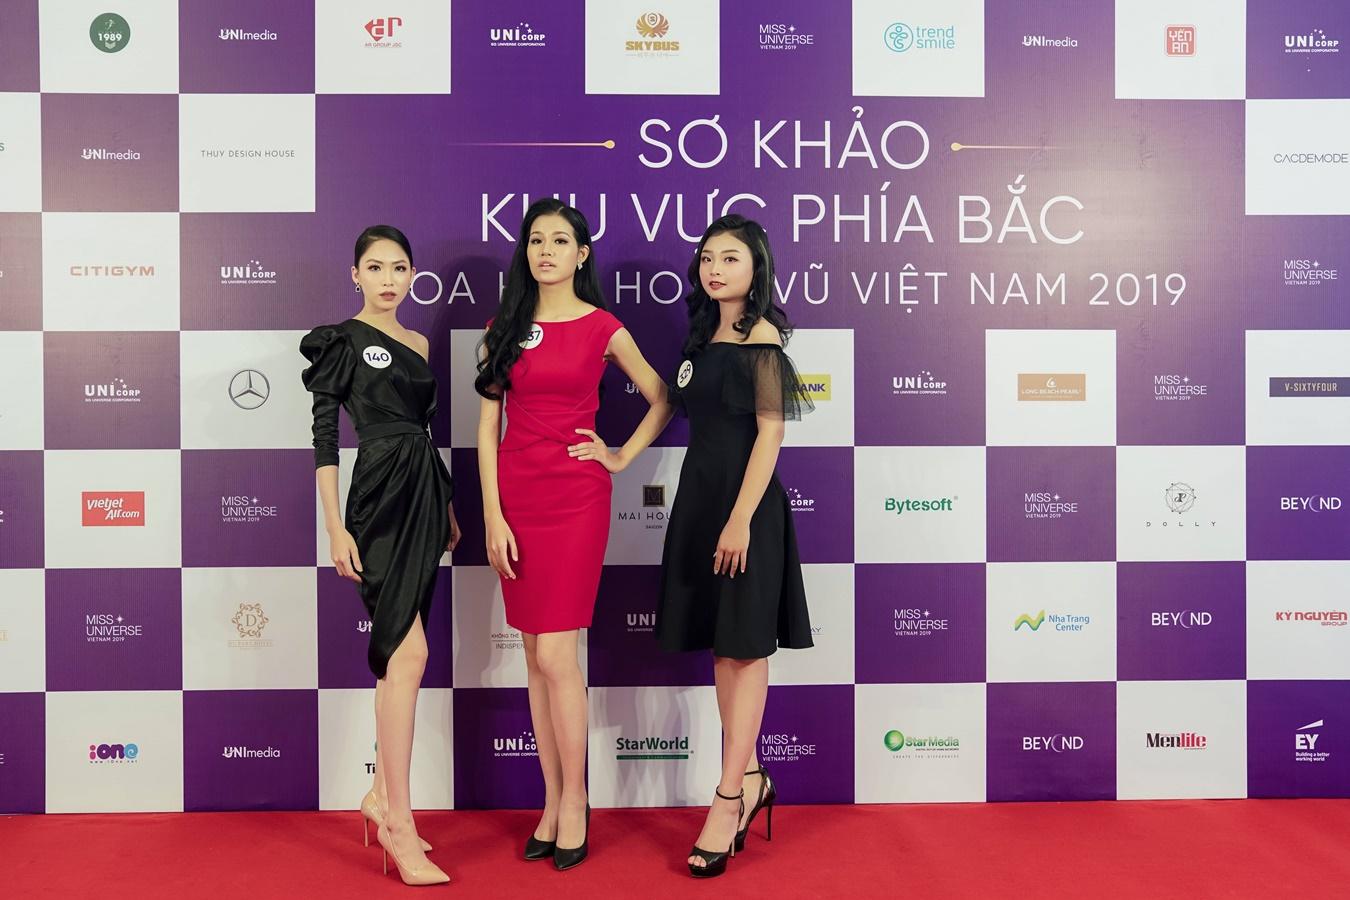 Thi sinh Hoa hau Hoan vu Viet Nam 2019 chup hinh o Backdrop (39)